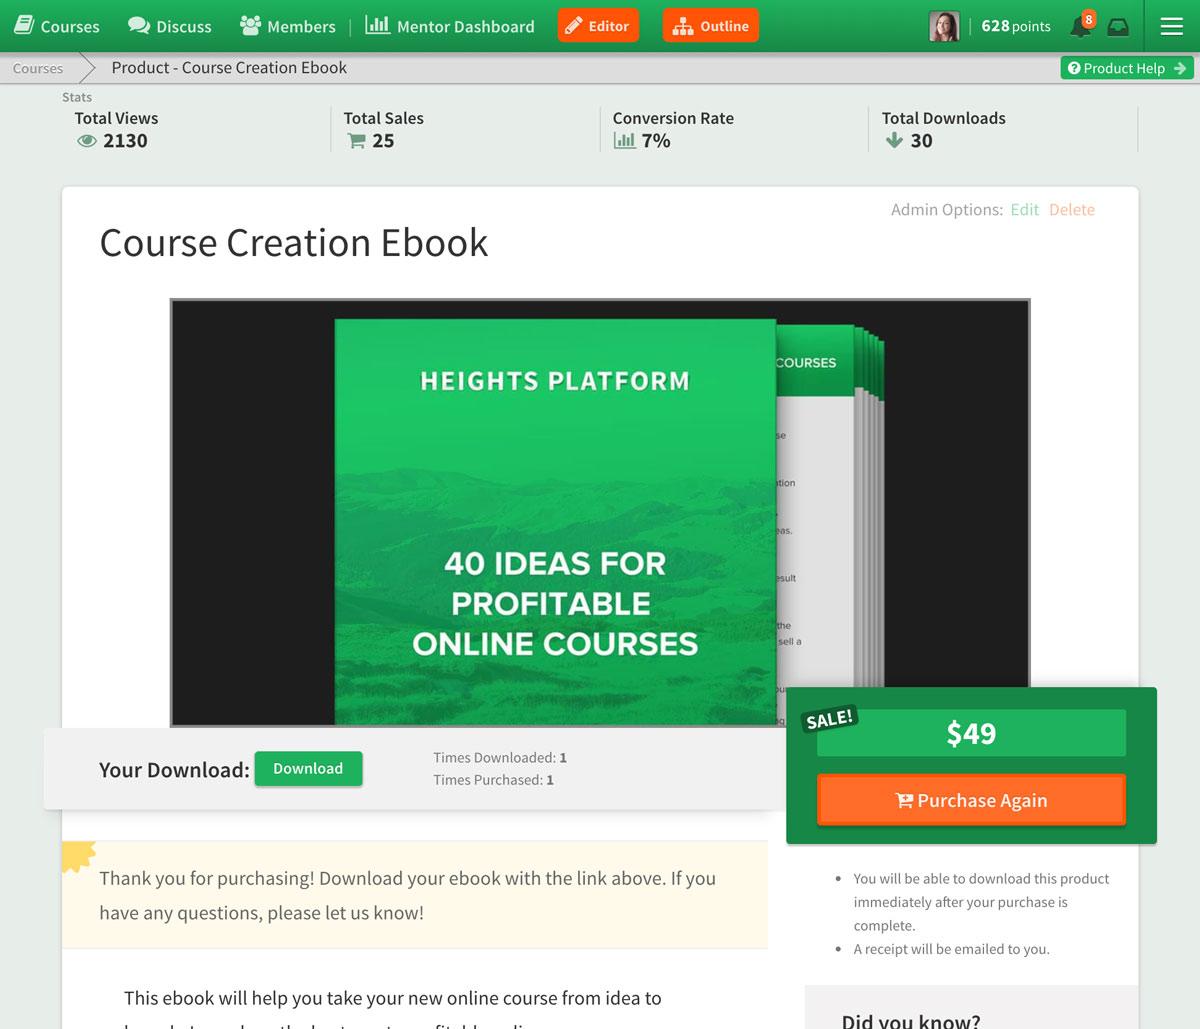 Heights Platform Digital Product Creation